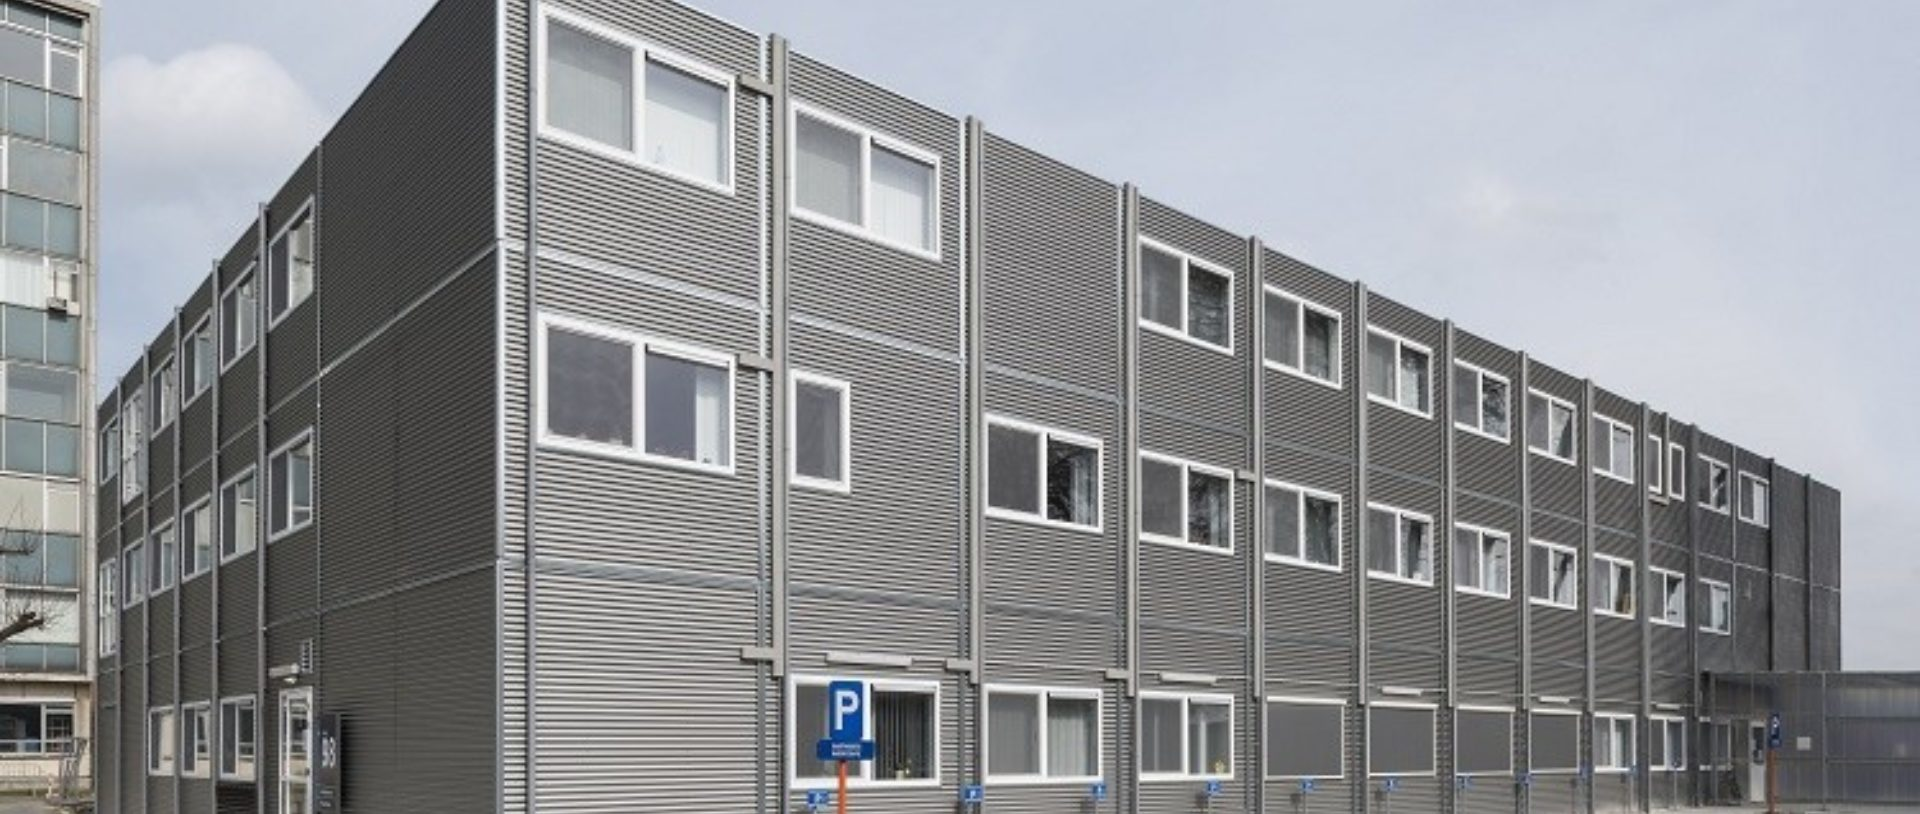 UZ Gent 01